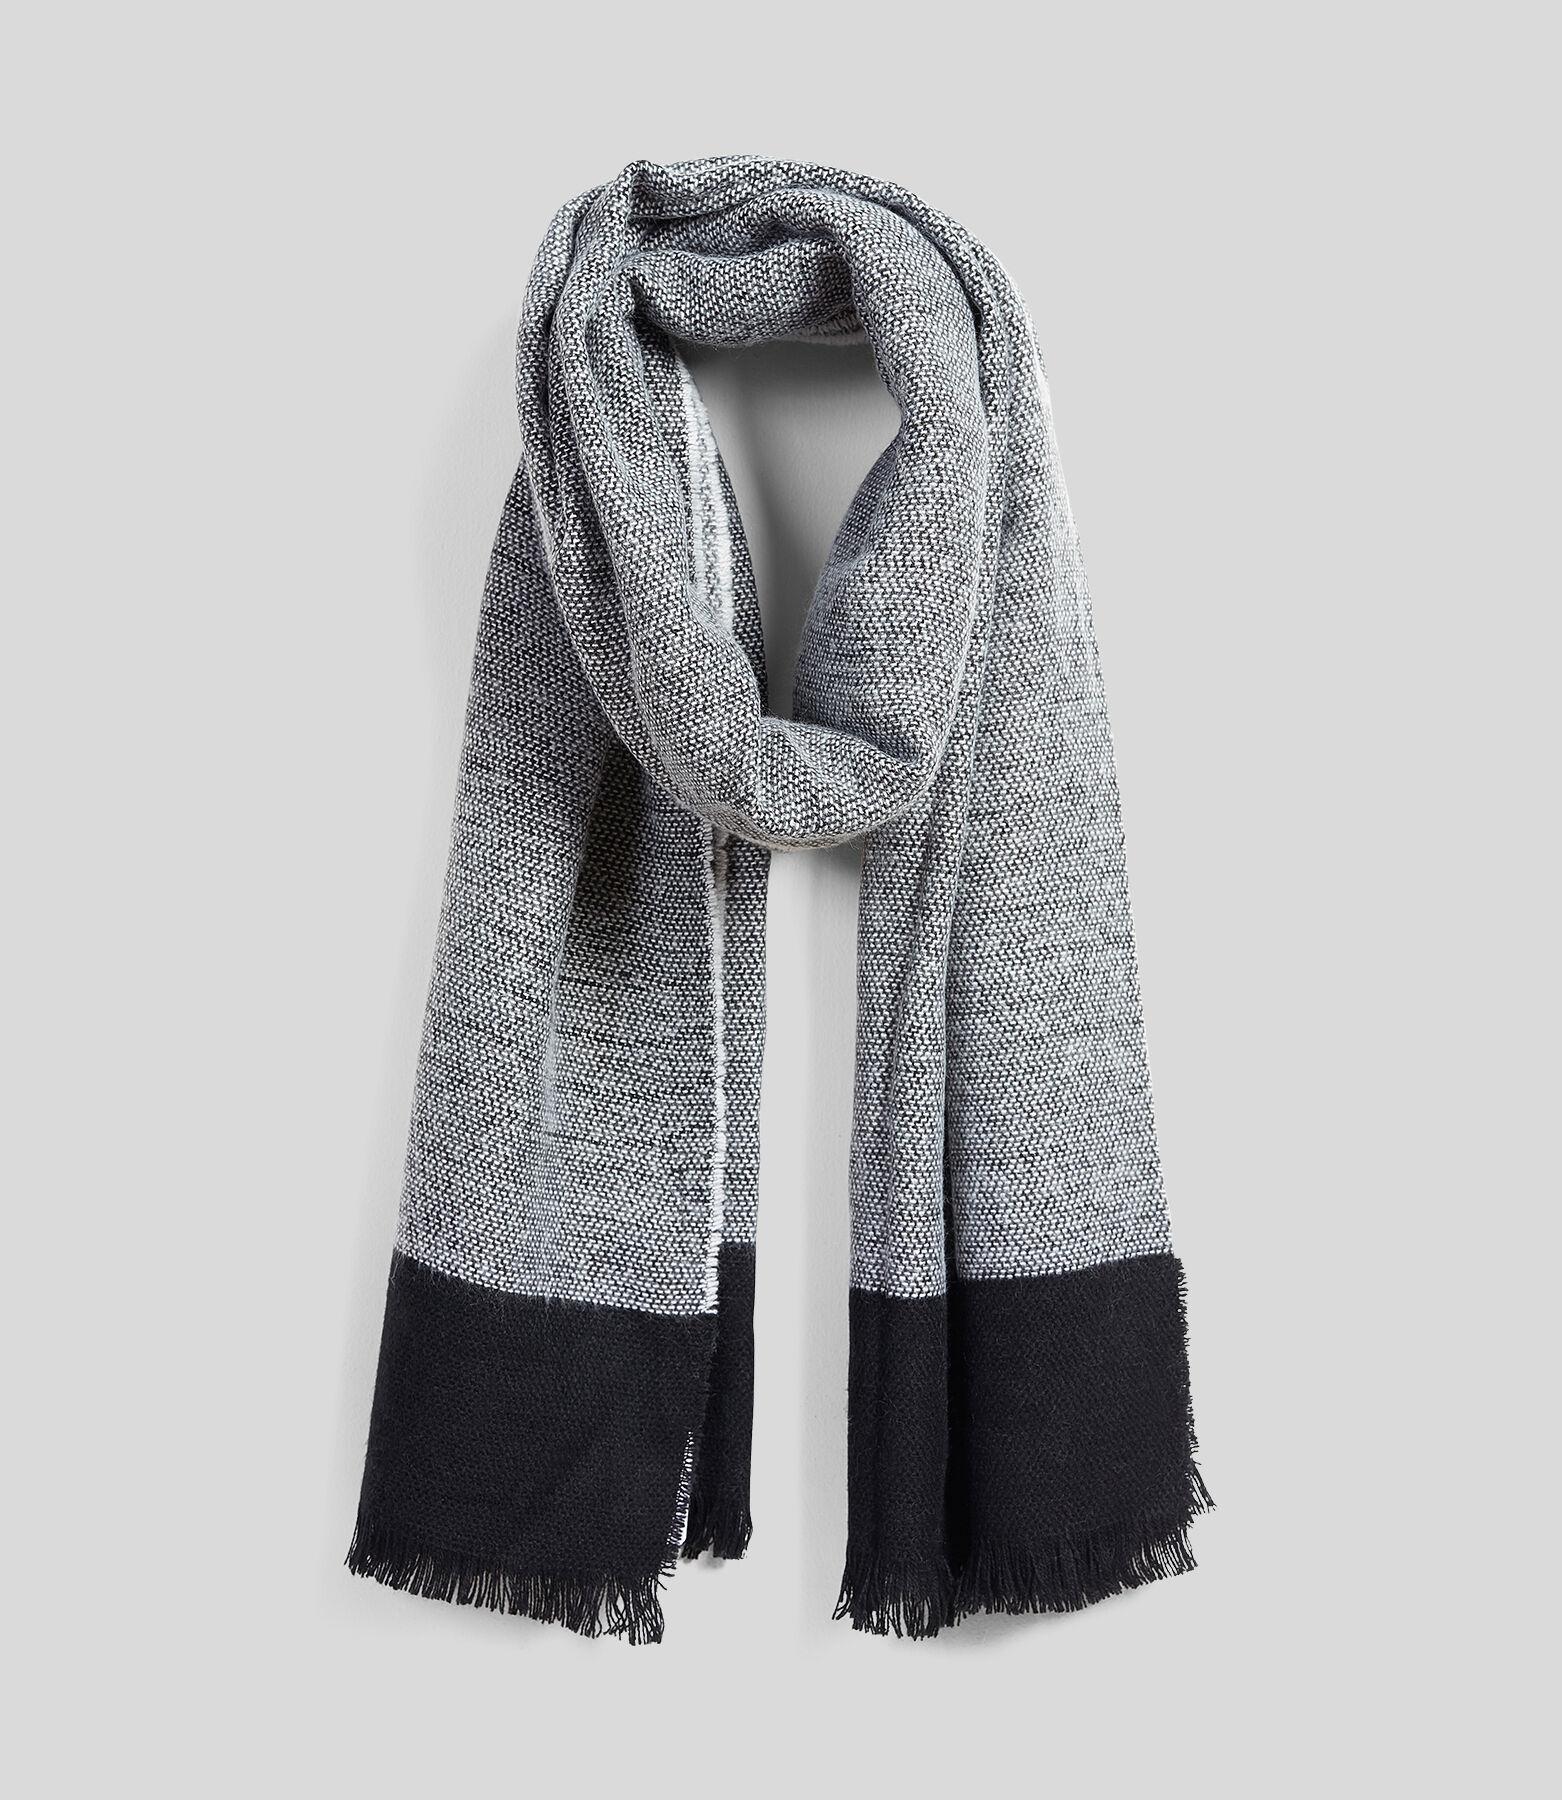 Colorblock sjaal, ketting en inslag